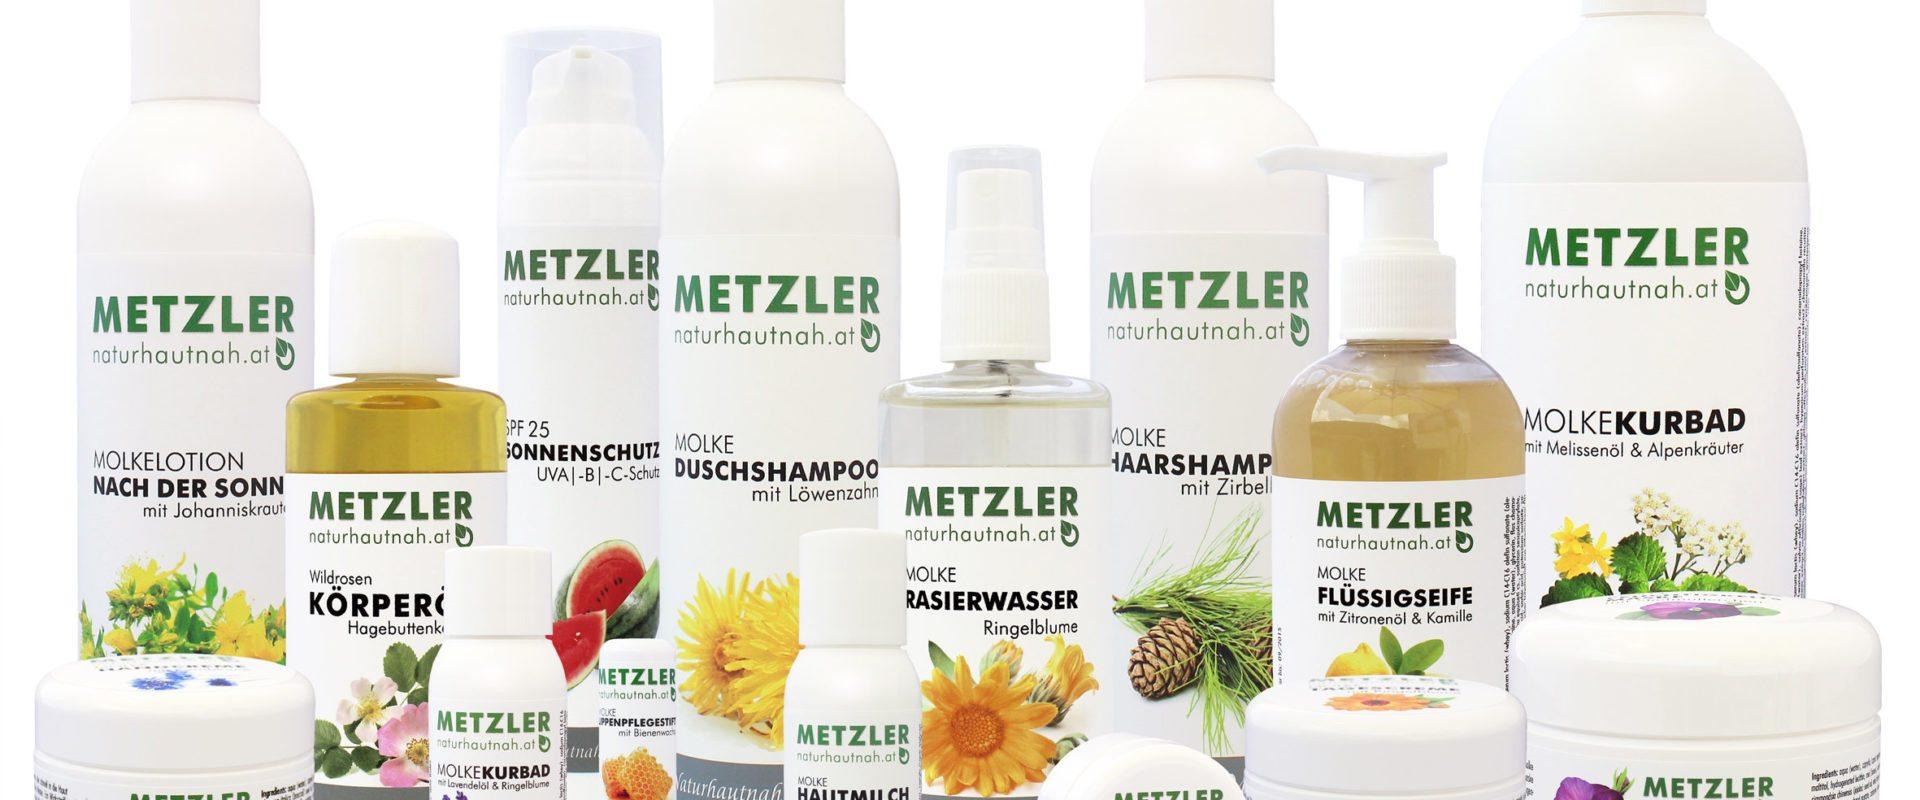 Metzler Molke © Metzler / naturhautnah.at